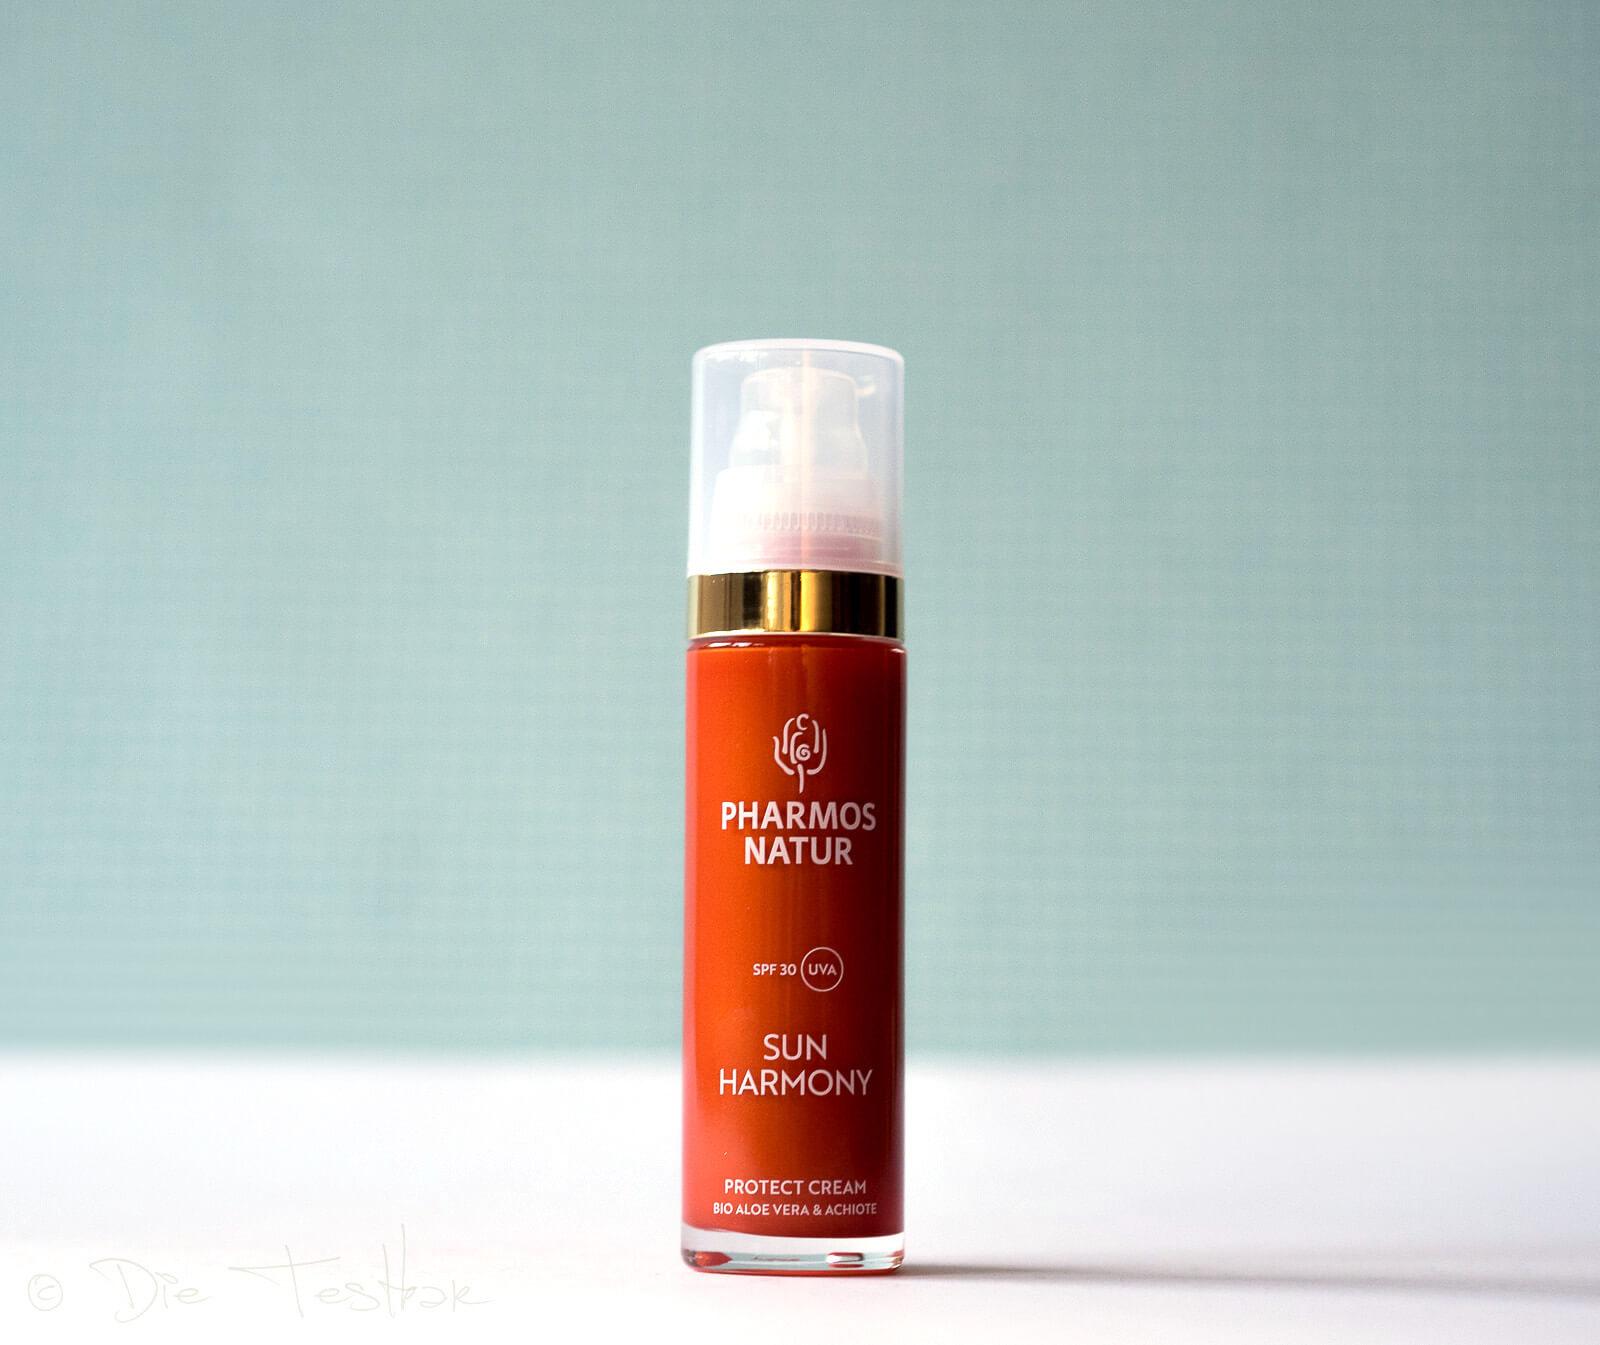 Sun Harmony Protect Cream von Pharmos Natur